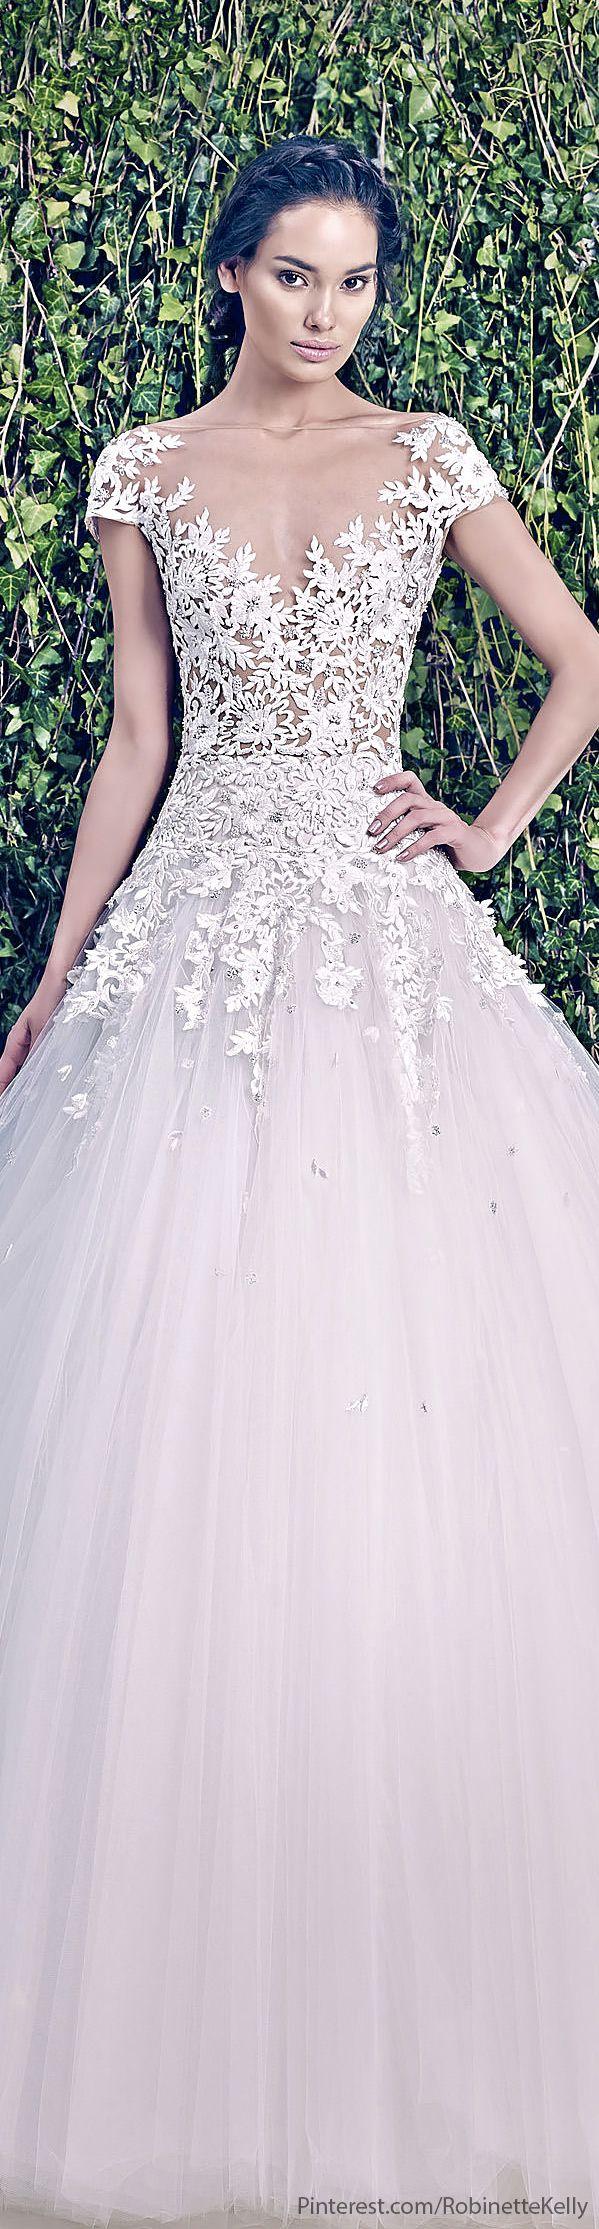 Zuhair murad bridal f w 2014 zuhair murad designs 1 for Zuhair murad 2014 wedding dresses